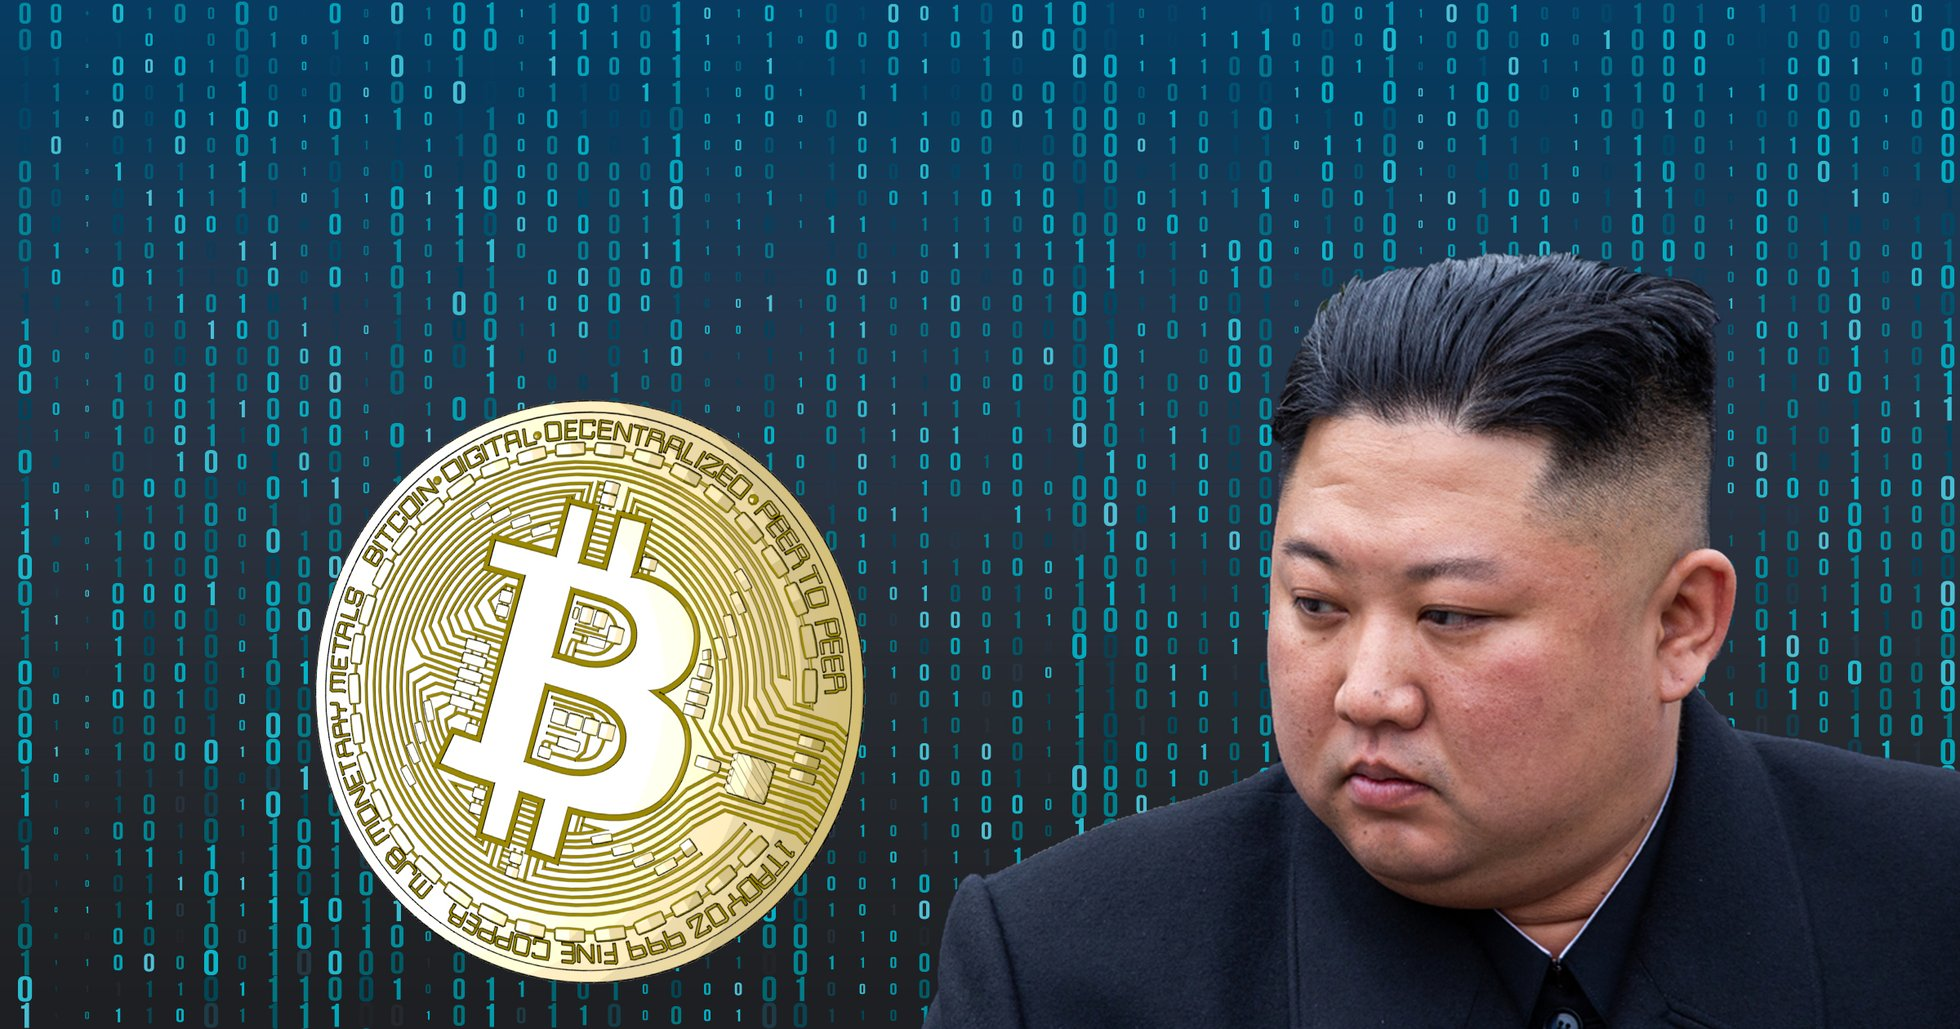 Hemlig FN-rapport: Nordkorea har stulit uppemot 19 miljarder kronor i kryptovalutor